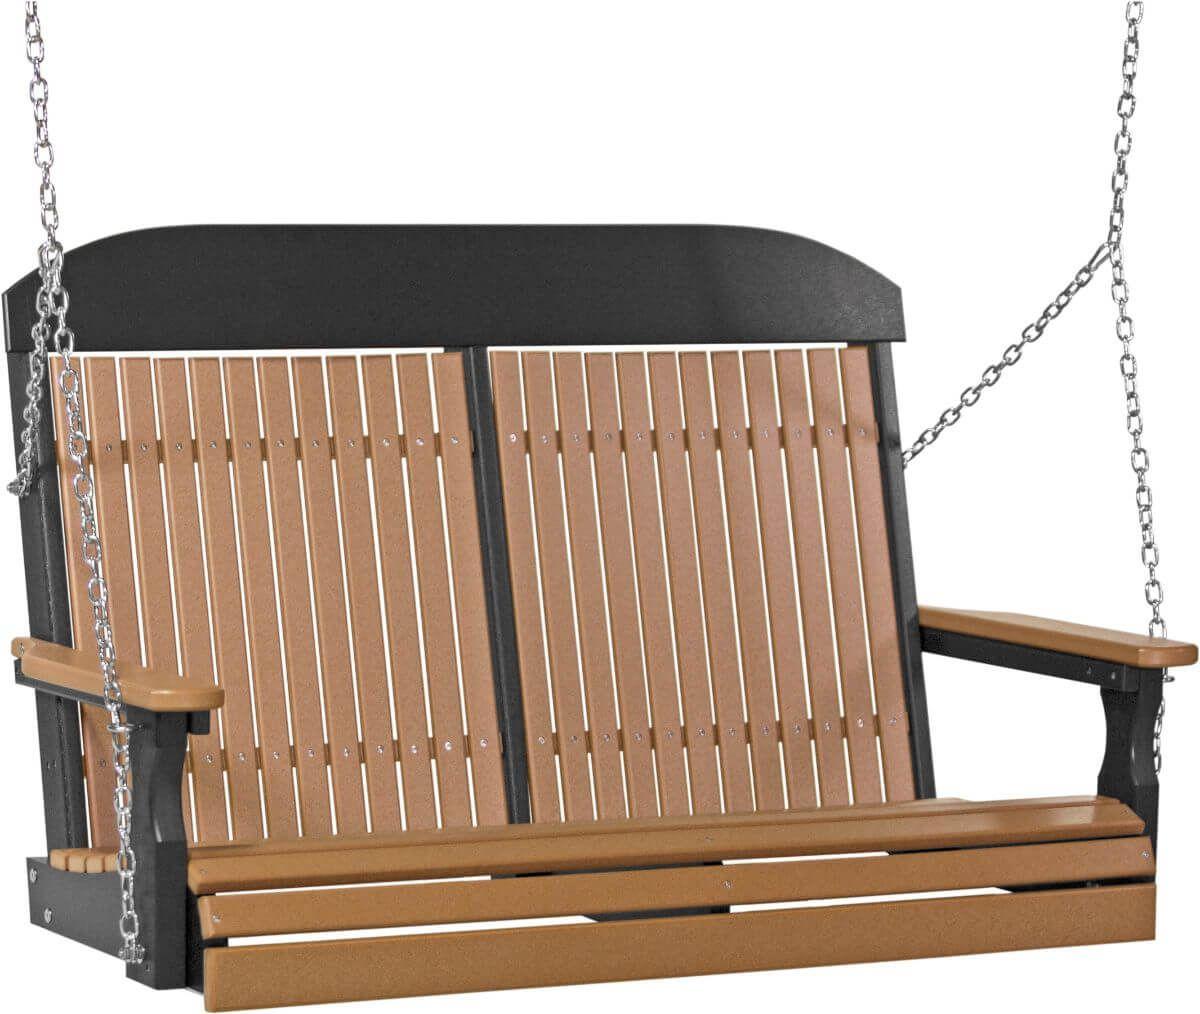 Cedar and Black Stockton Porch Swing